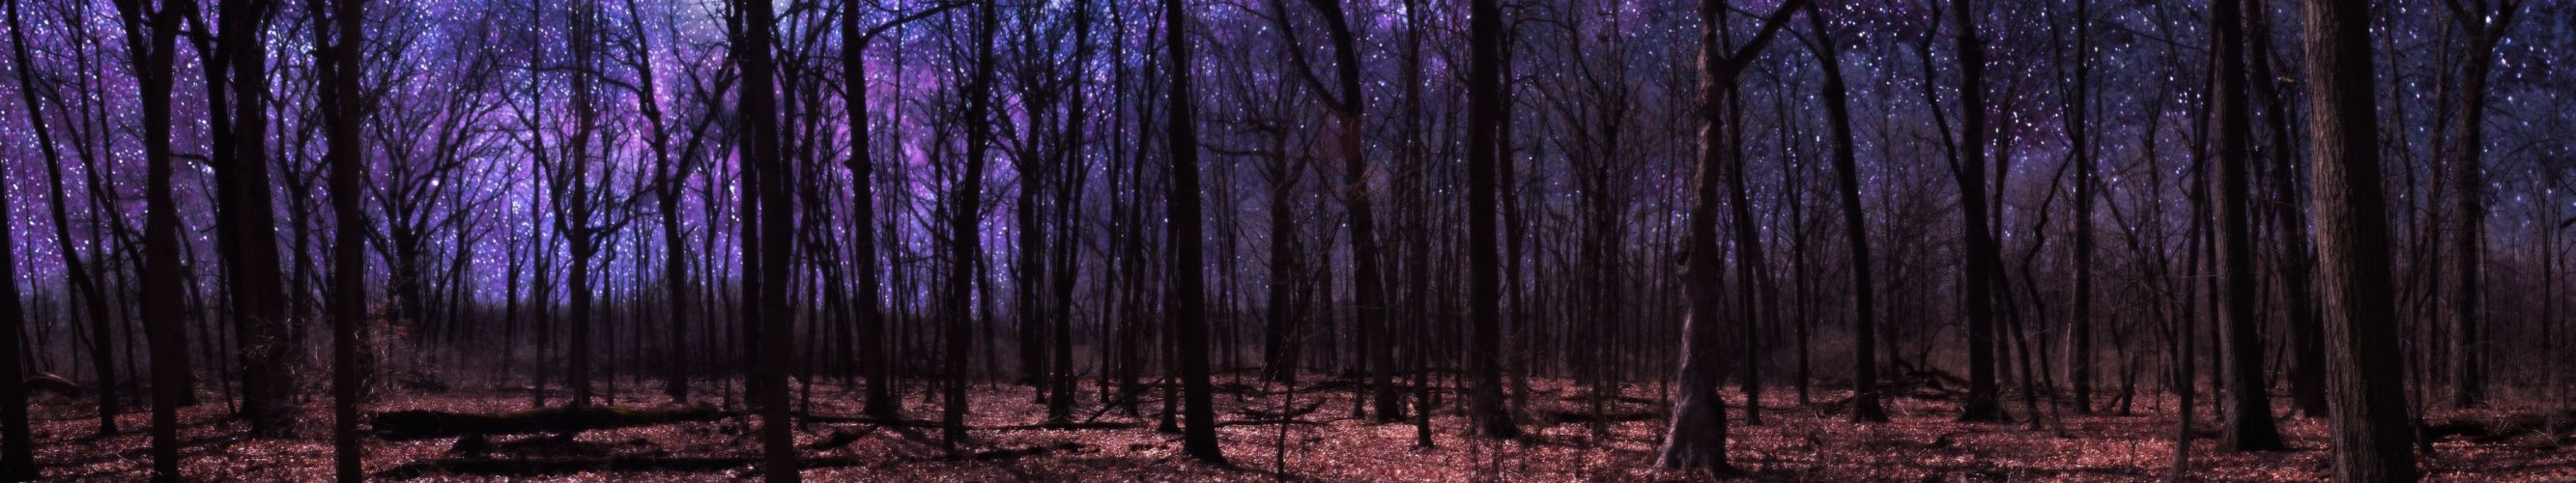 forest foret wallpaper